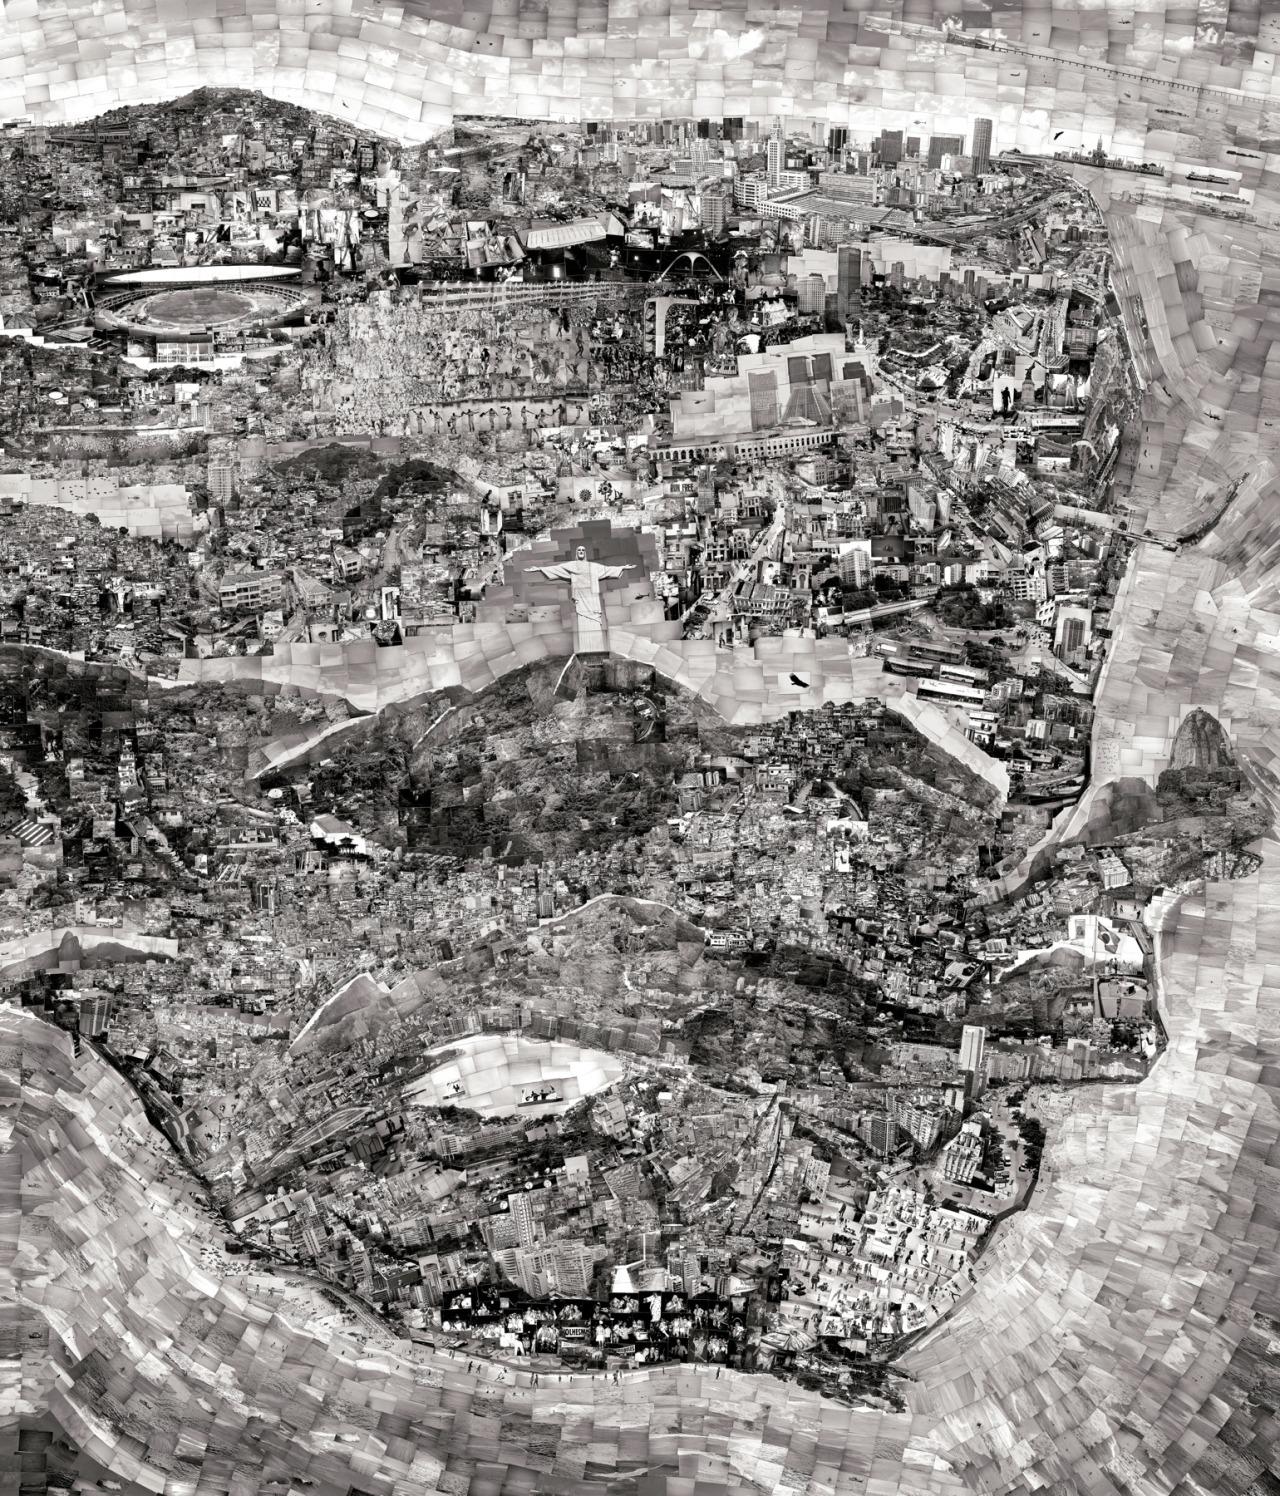 """Diorama Map Rio de Janeiro"" (2011) by Sohei Nishino (Image courtesy of Michael Hoppen Gallery)"